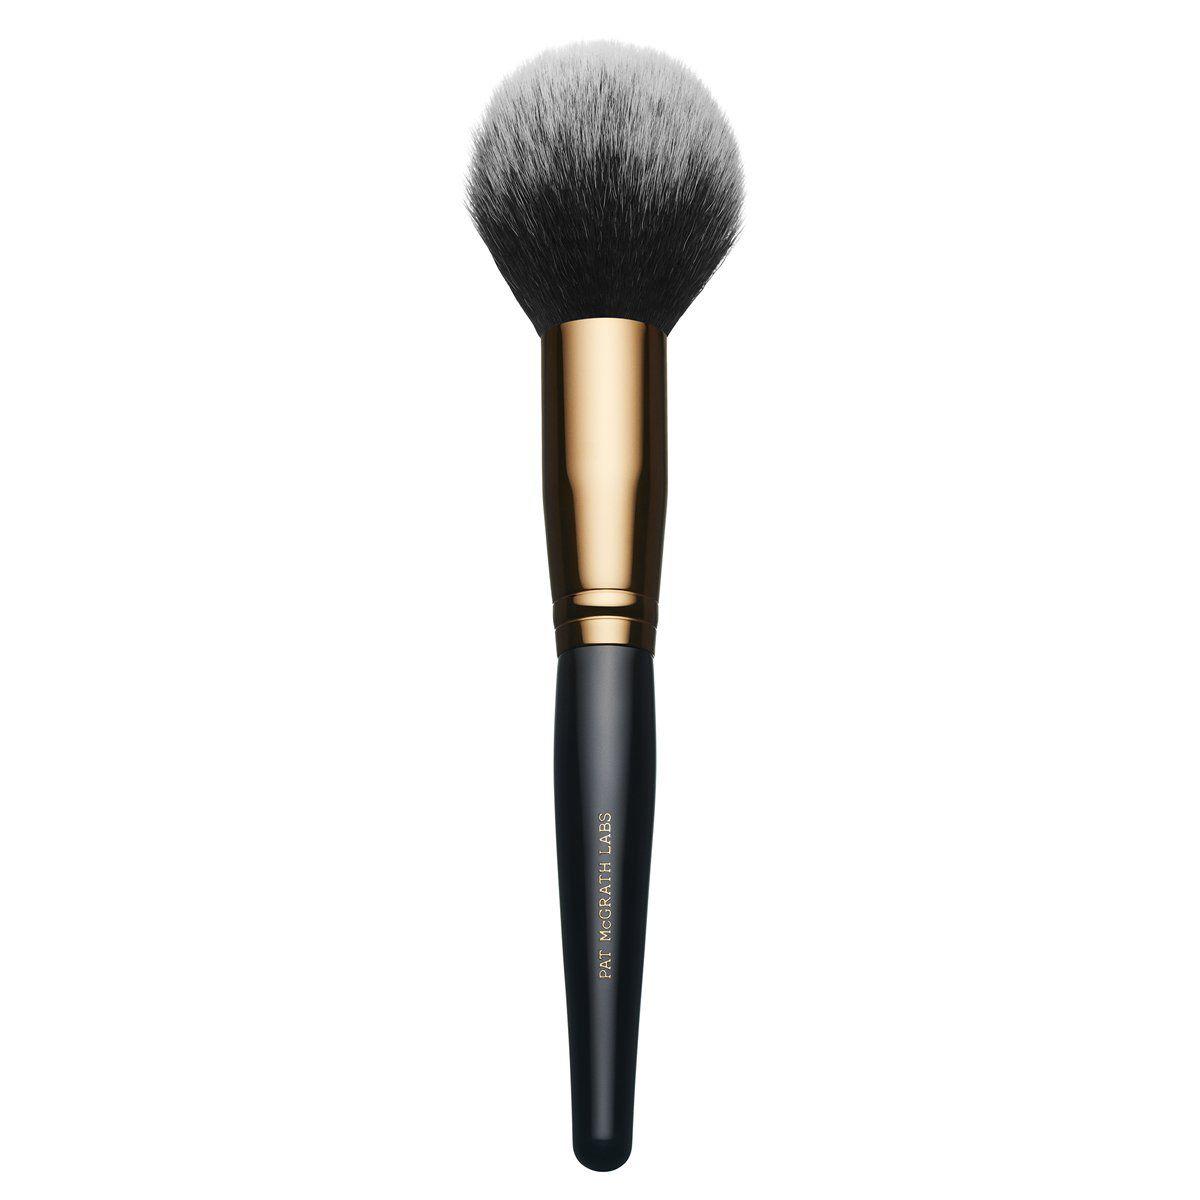 Pat McGrath Labs Sublime Perfection Powder Brush